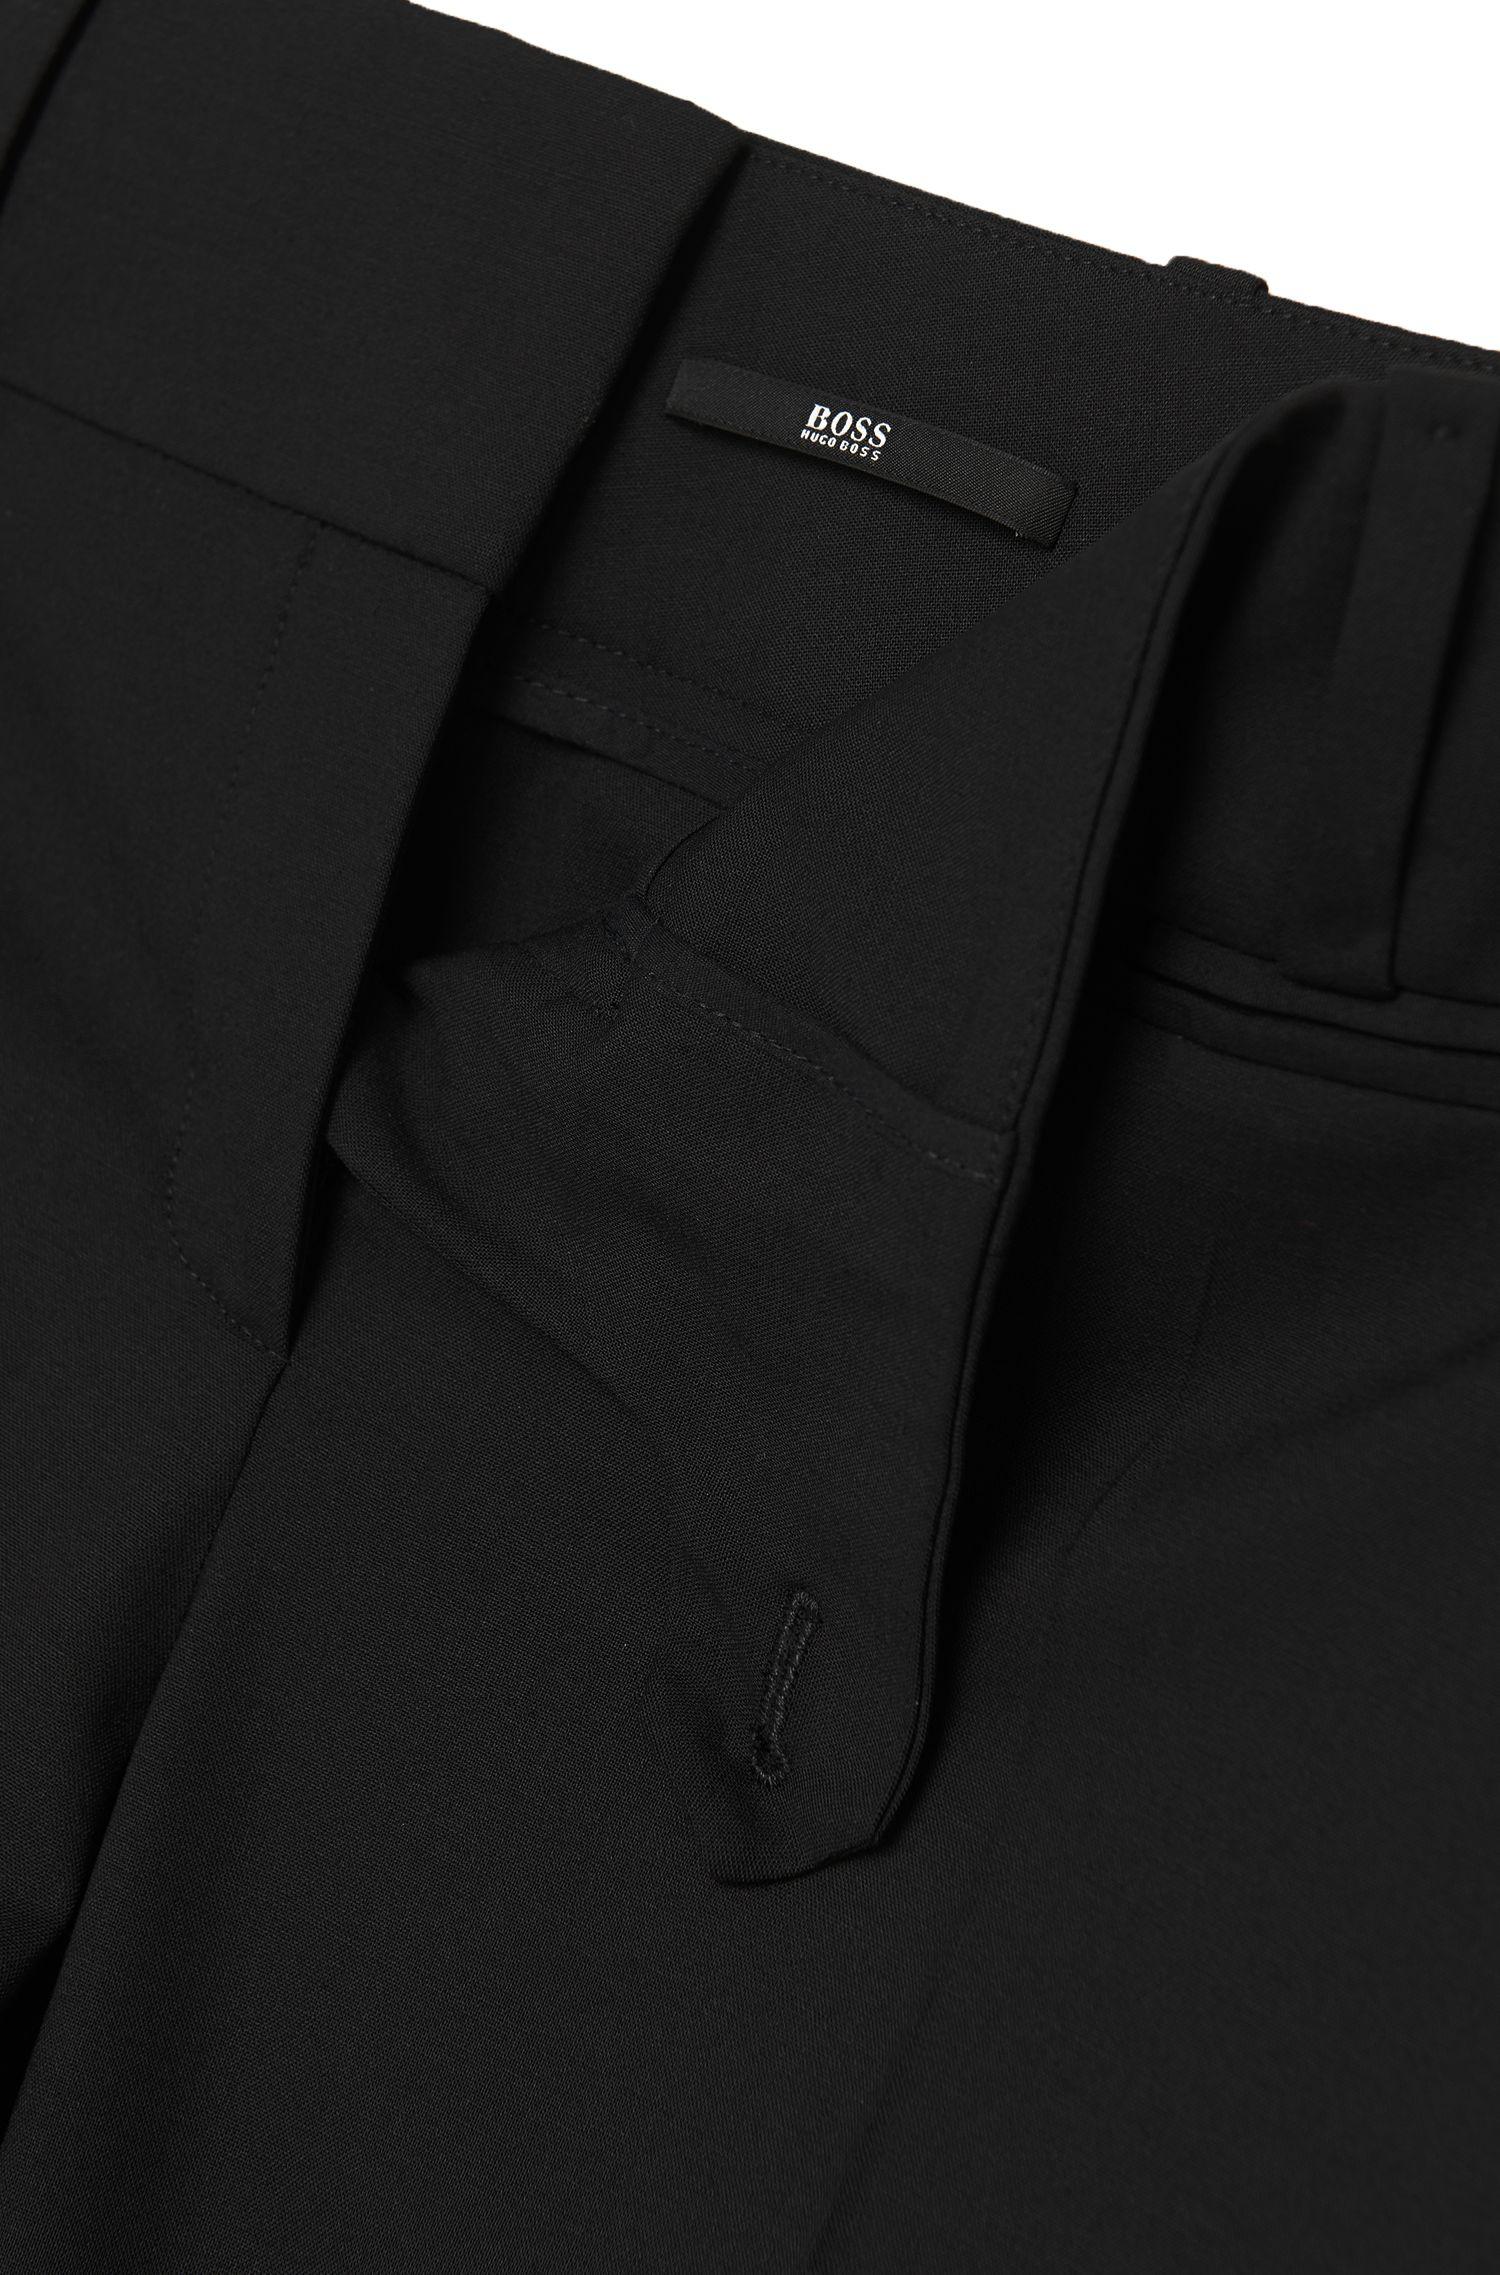 Pantalon Regular Fit «Tuliana2»en laine vierge mélangée